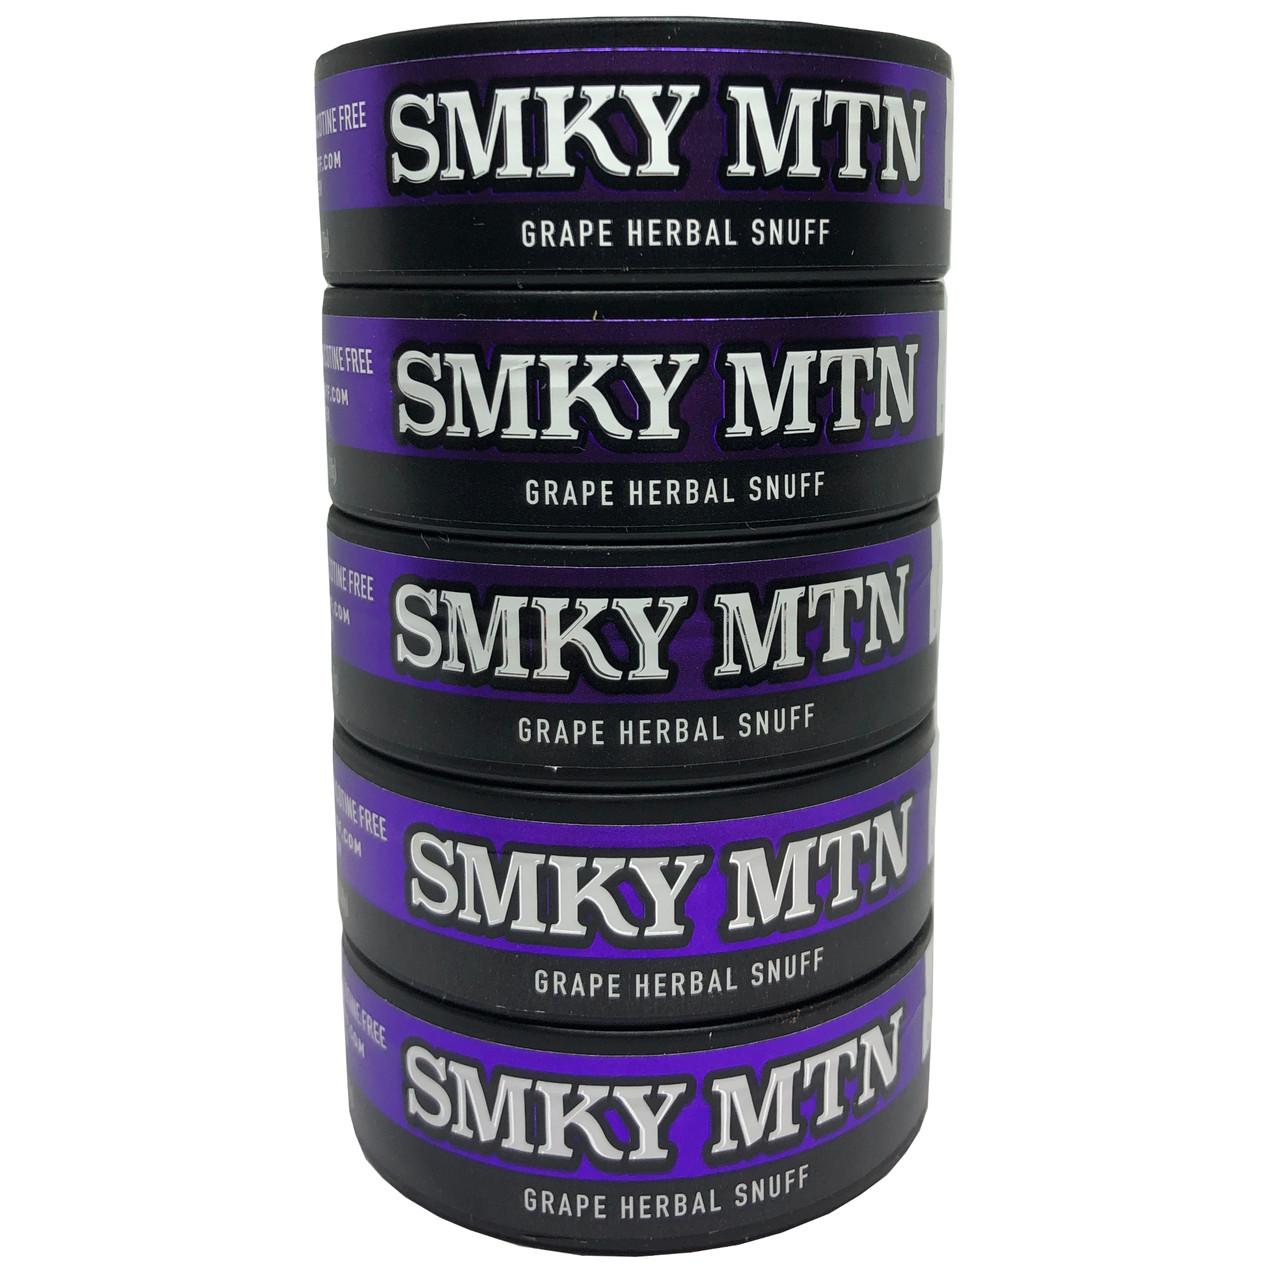 Smokey Mountain Grape Herbal Snuff 5 Cans